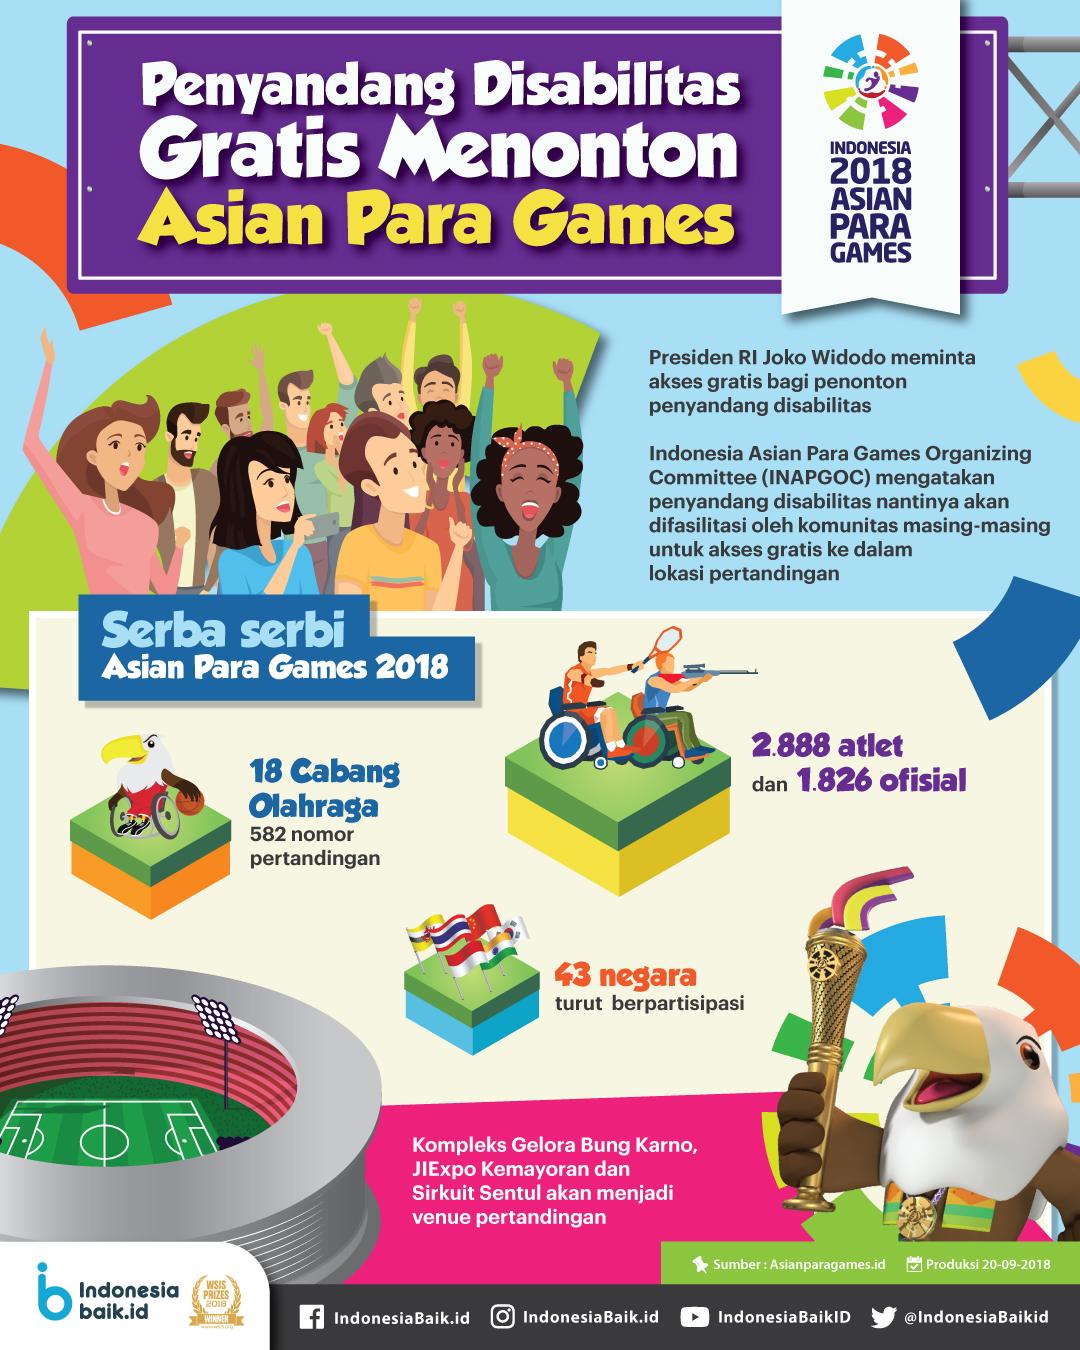 Penyandang Disabilitas Gratis Menonton Asian Para Games